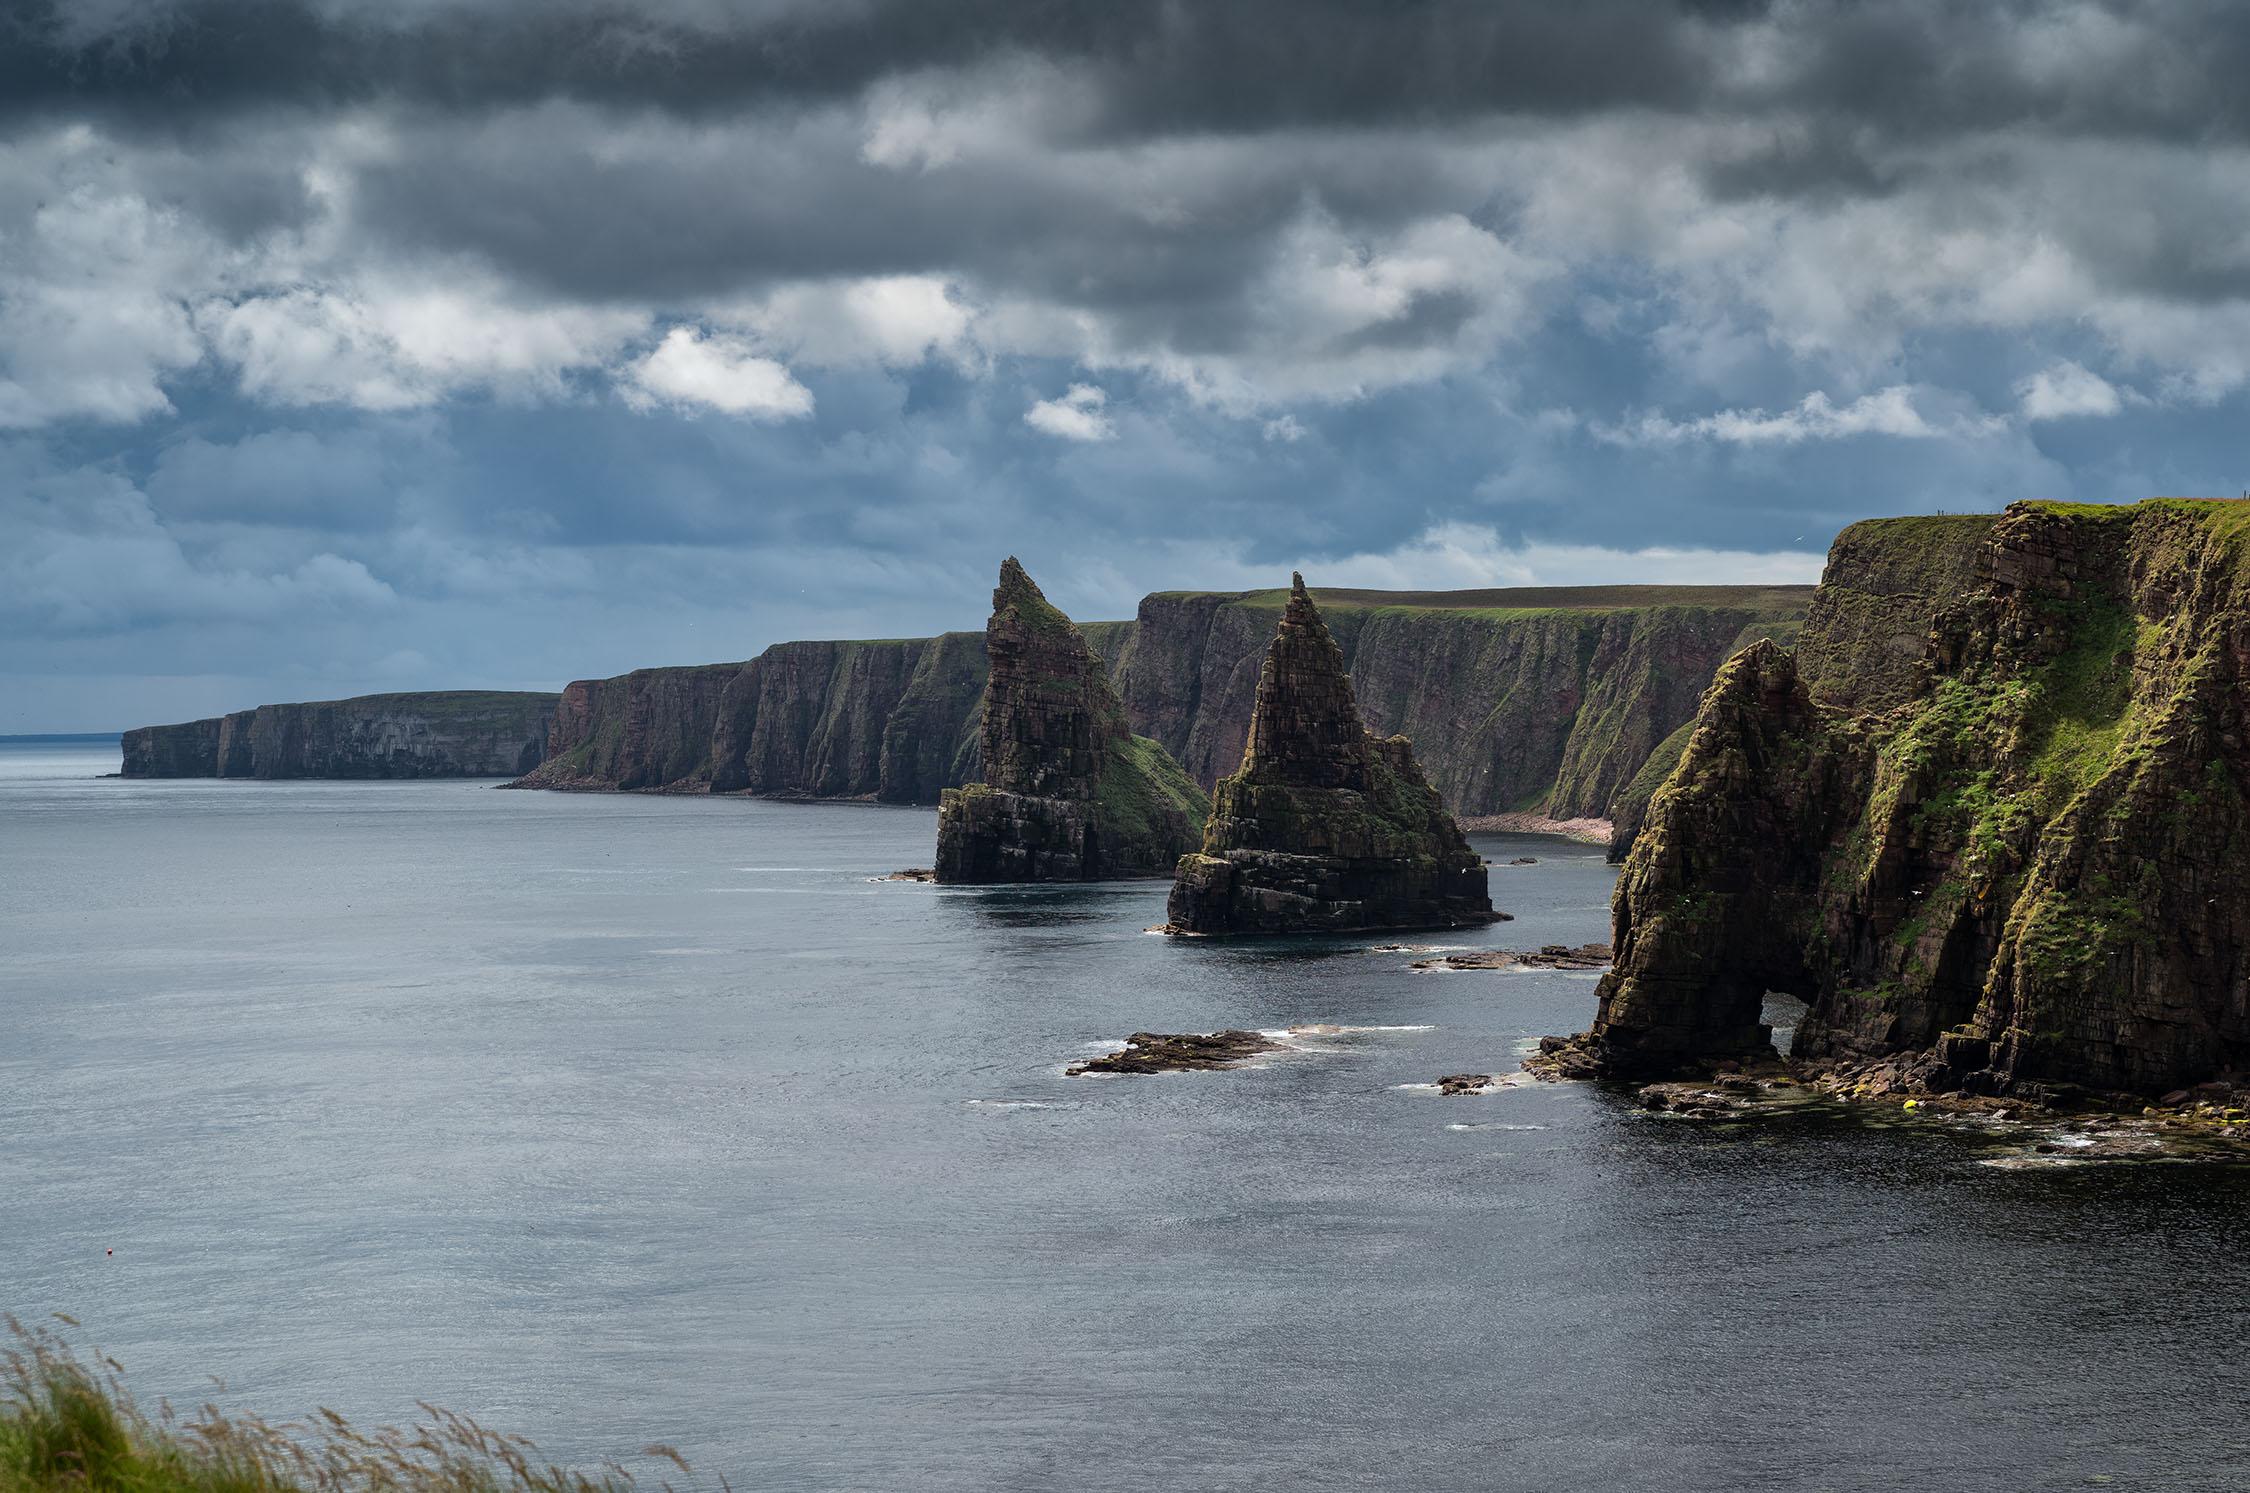 Sea Stacks and Cliffs, Duncansby Head. Leica S2. Bob Hamilton